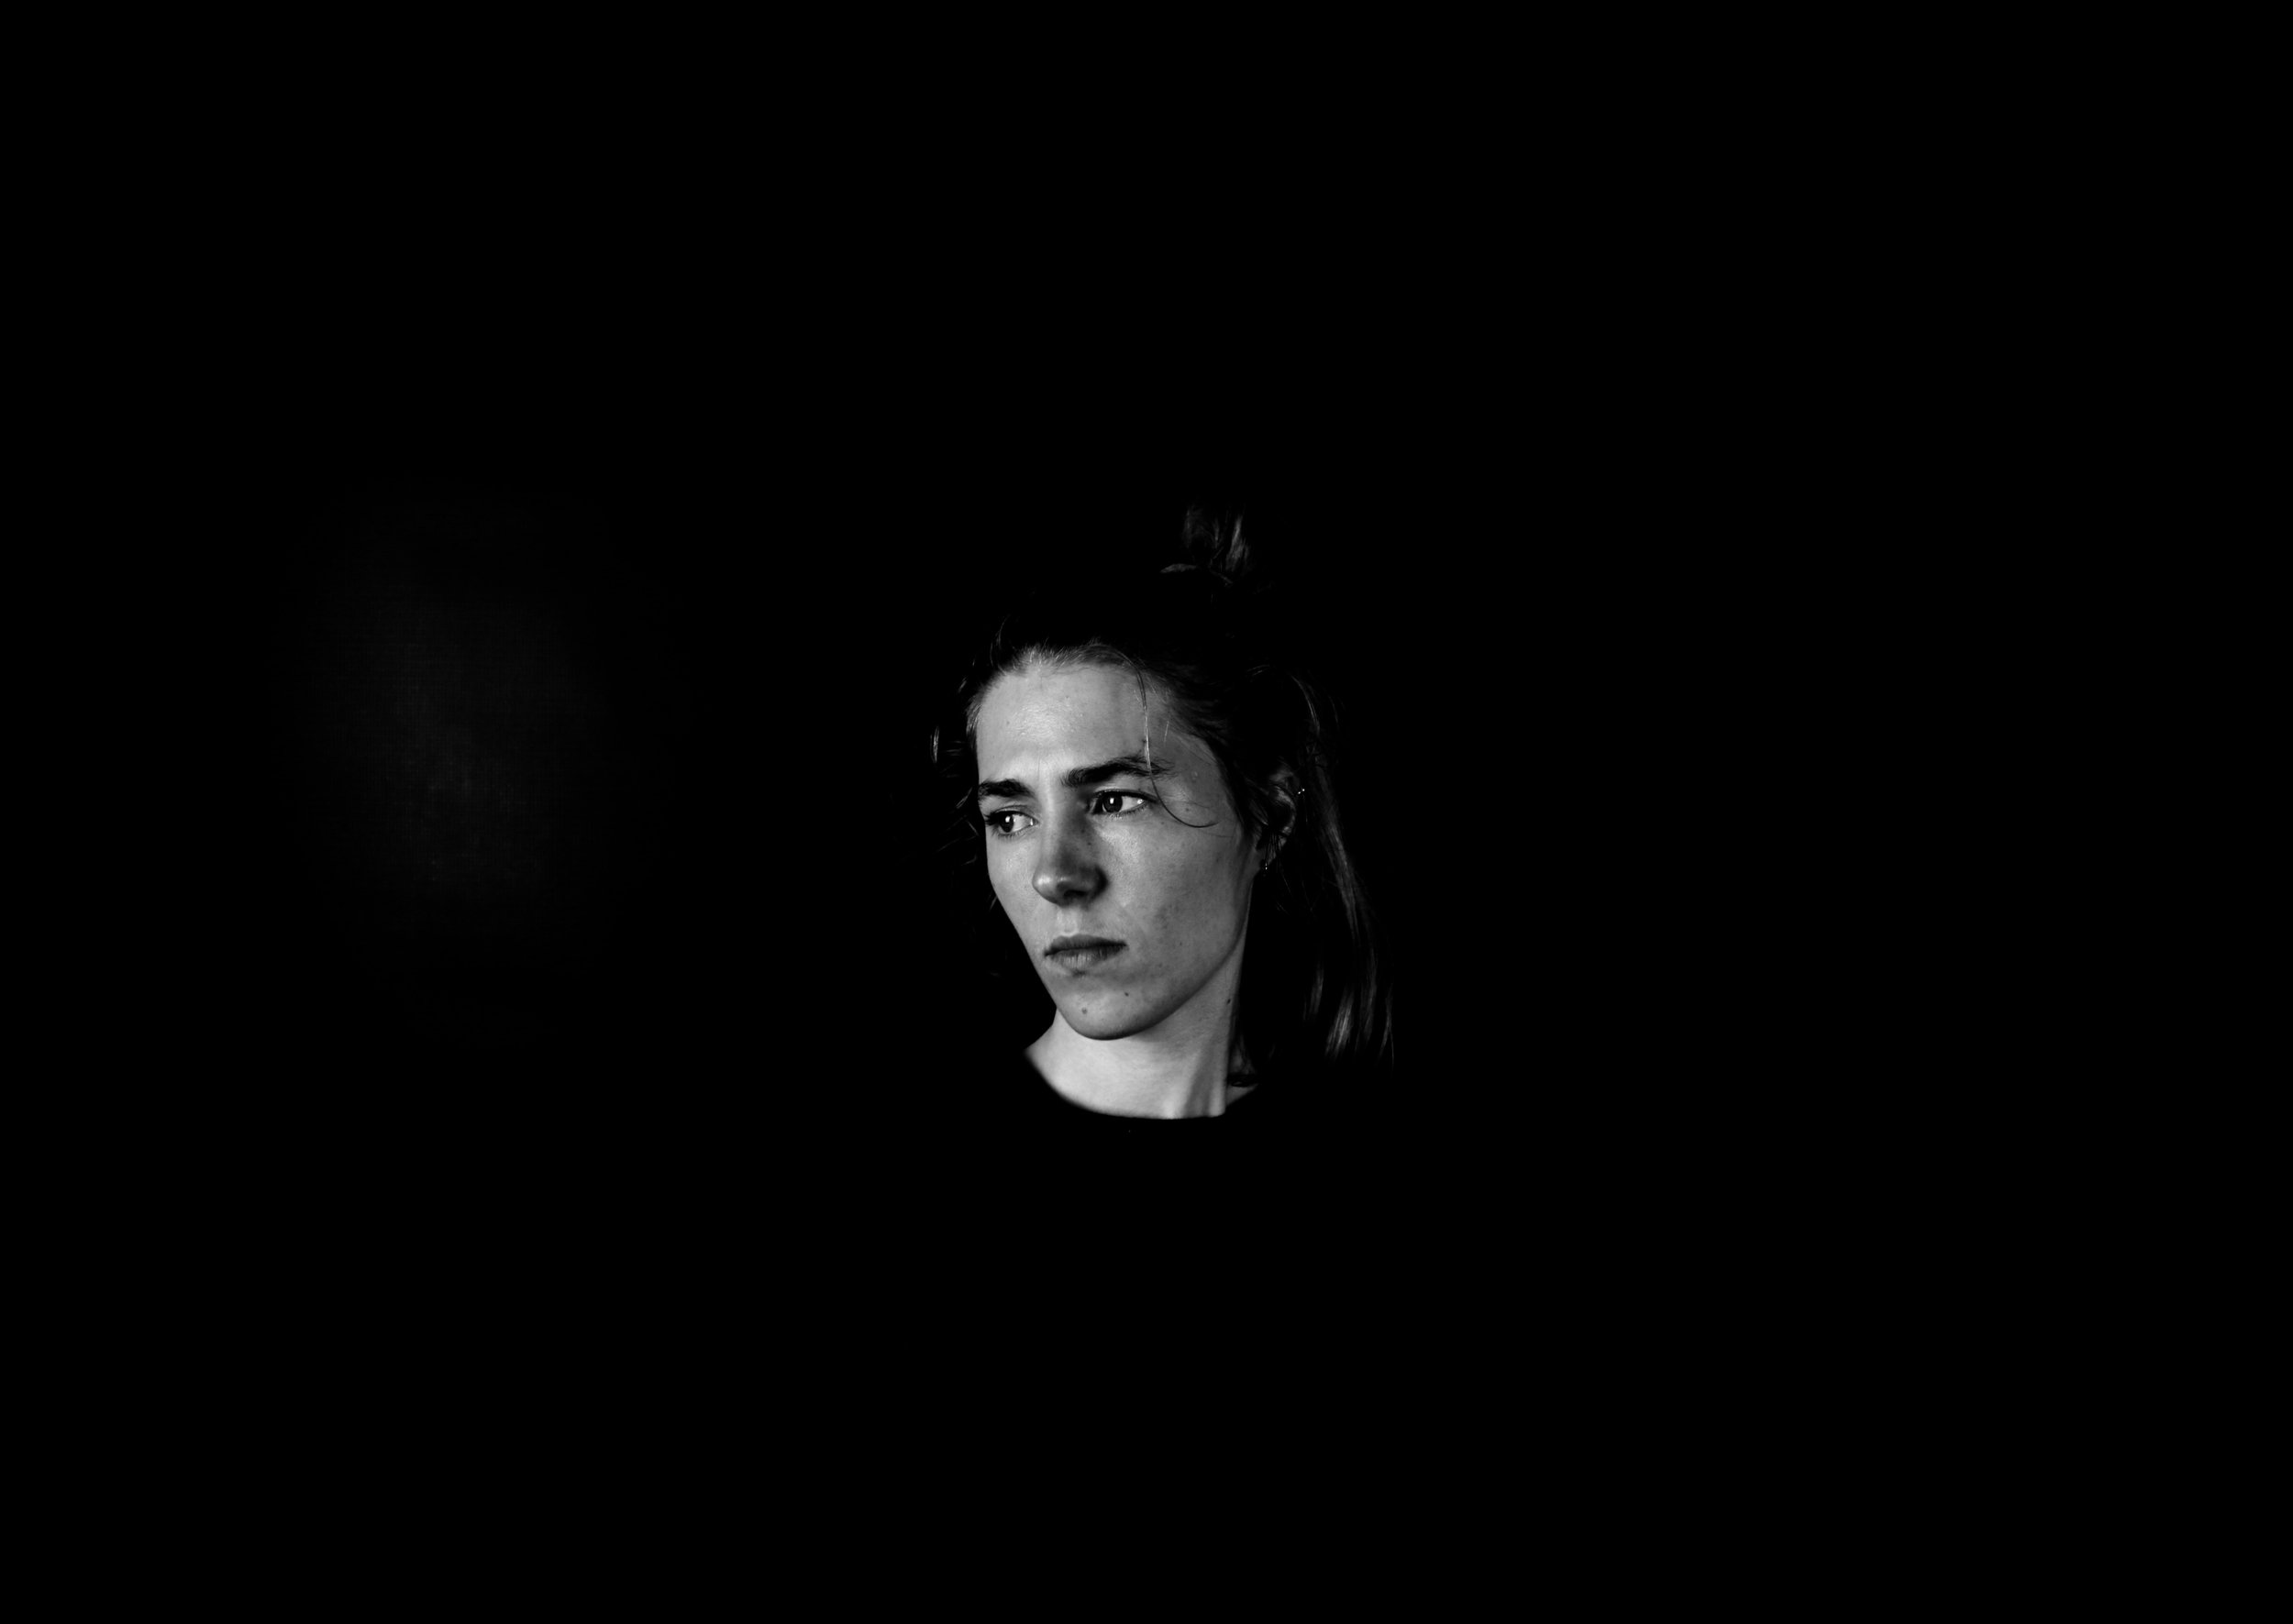 Samana, Photography, Rebecca Rose Harris Portrait - Black and White